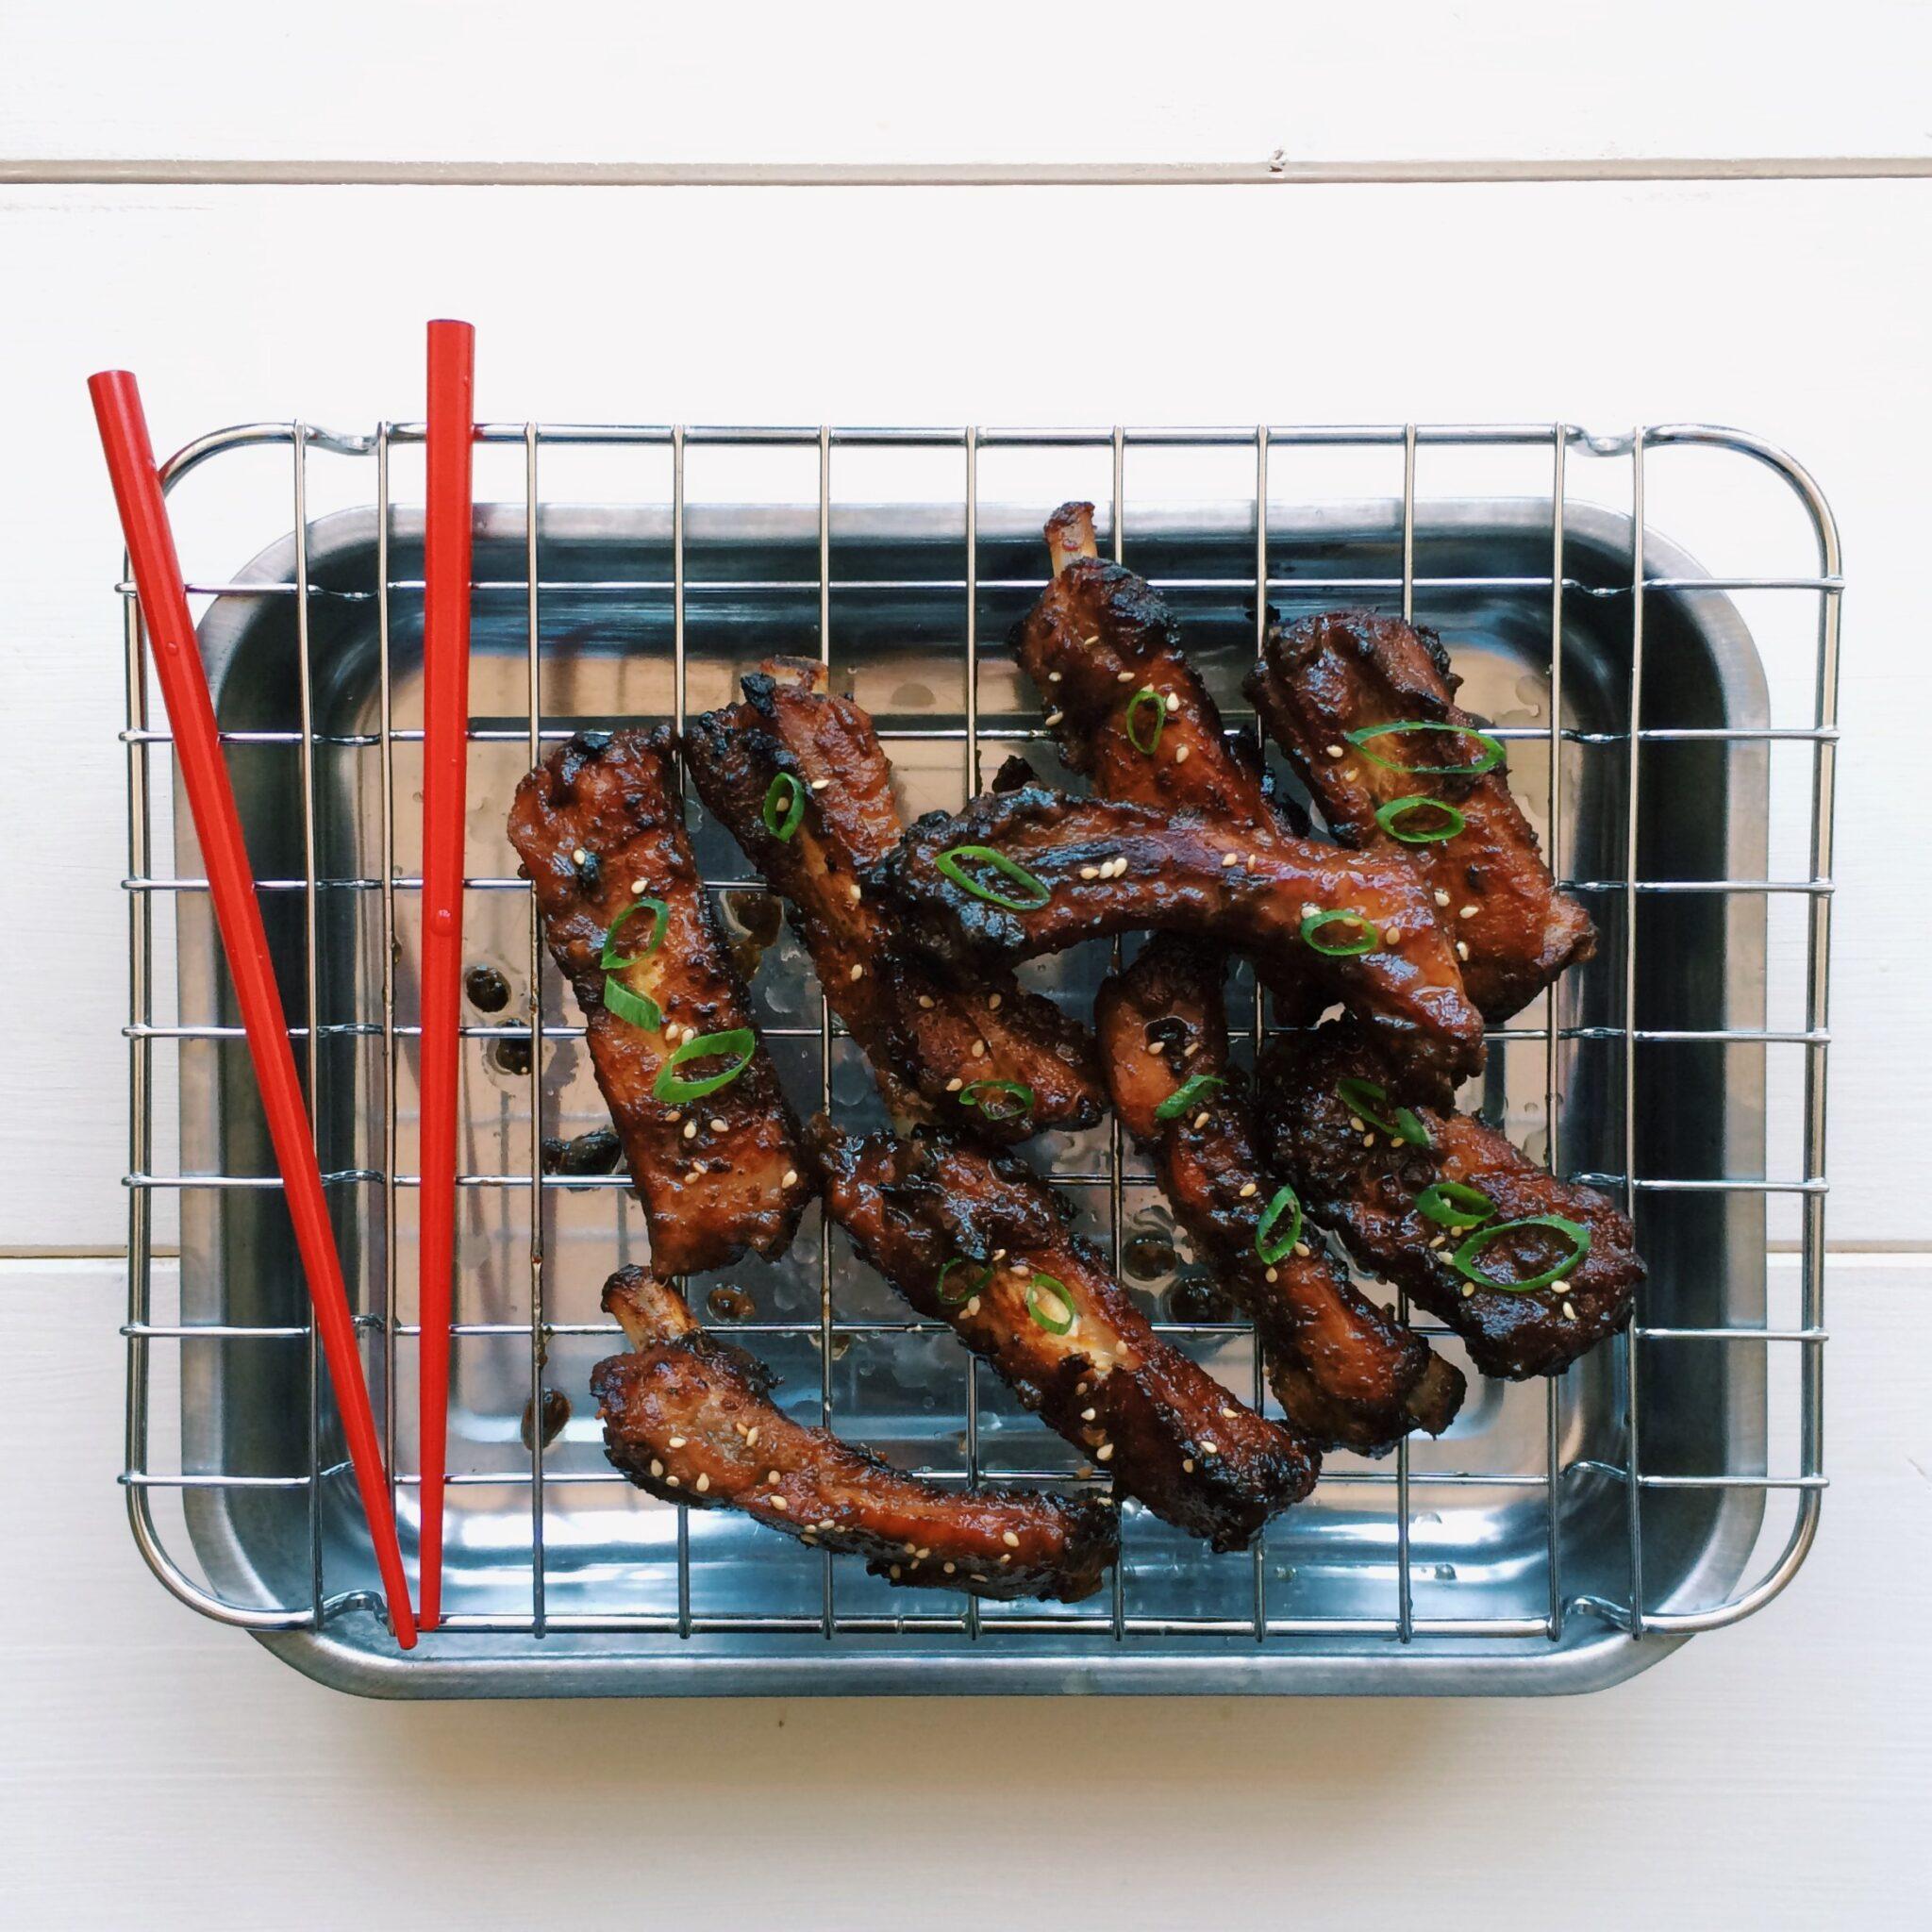 IMG 5627 e1411544603999 - My Vietnamese Kitchen, cookbook inspiration